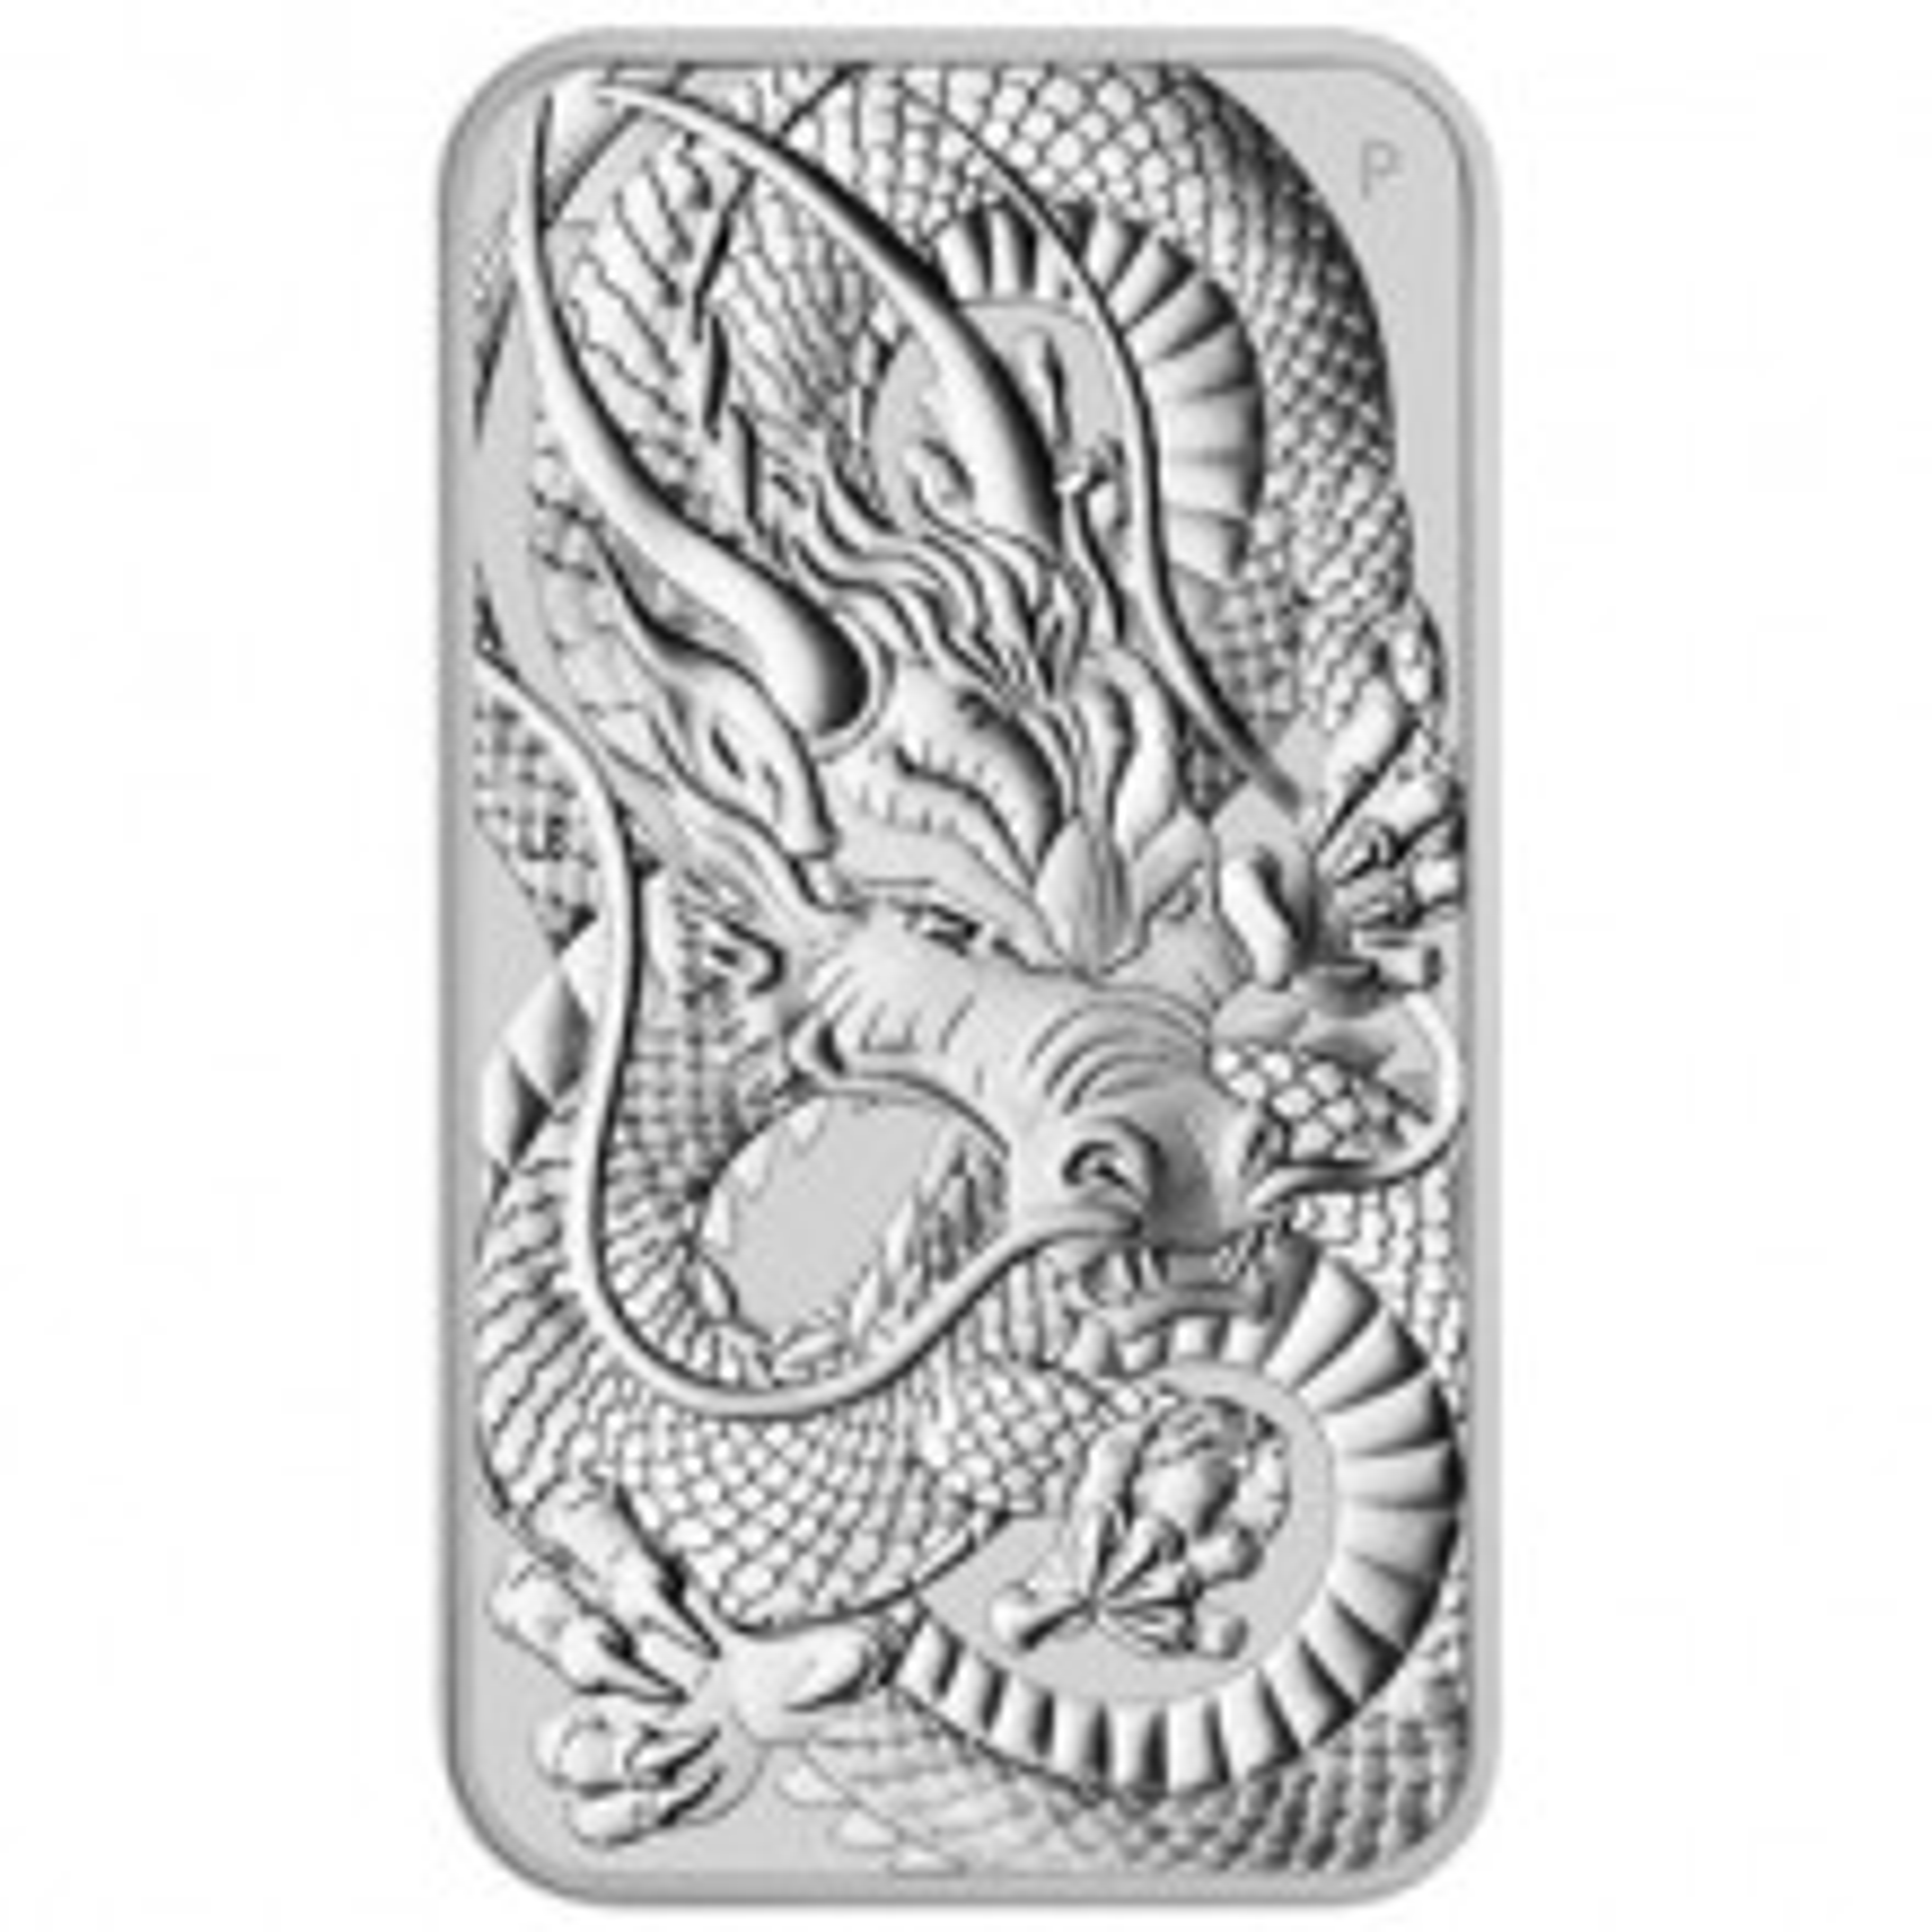 1 Troy ounce zilveren muntbaar Rectangular Dragon 2021